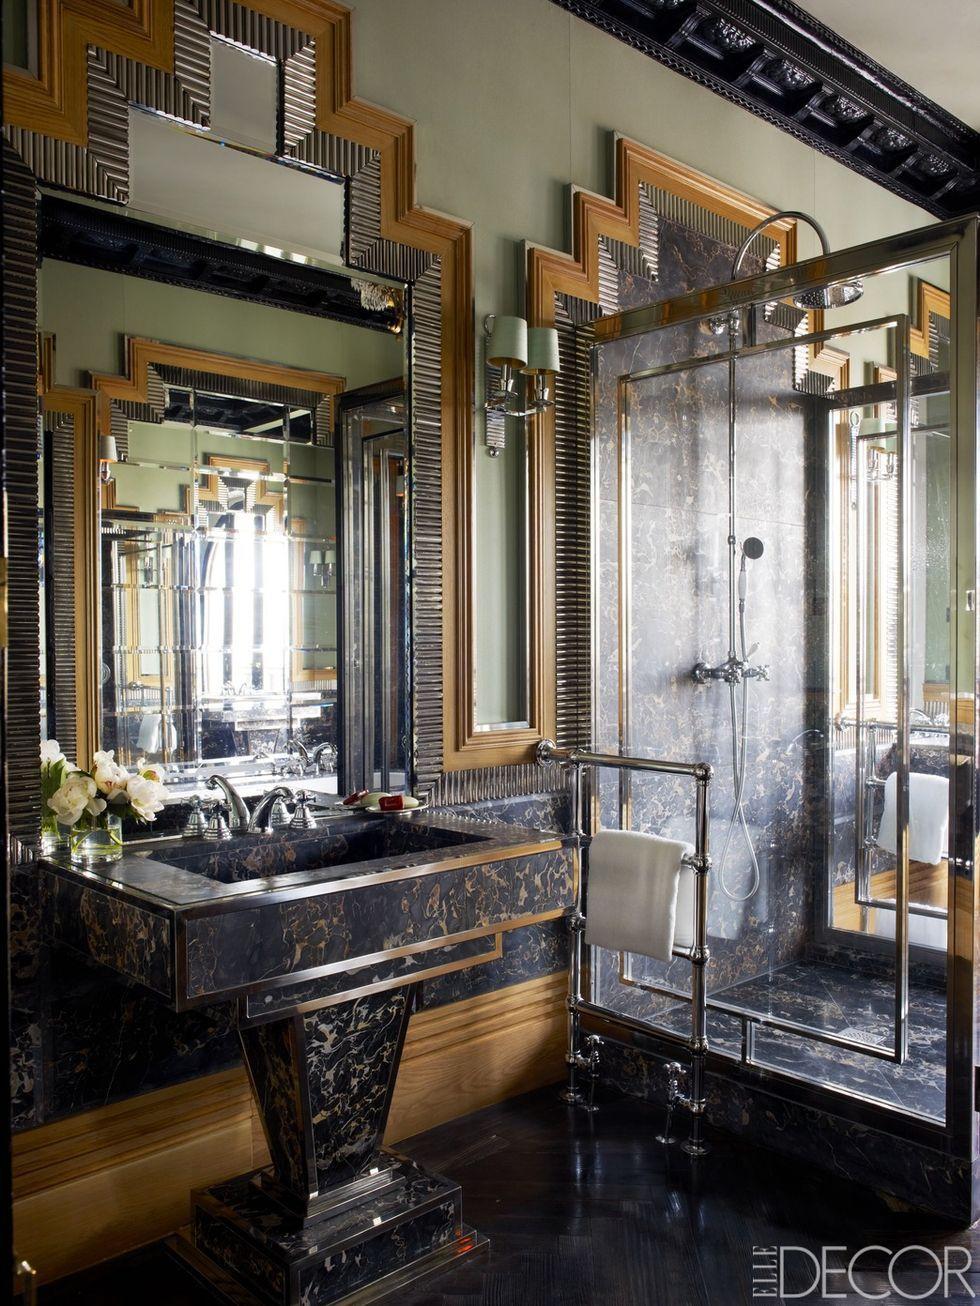 Black home decor Addams Family House Elle Decor 35 Black Room Decorating Ideas How To Use Black Wall Paint Decor